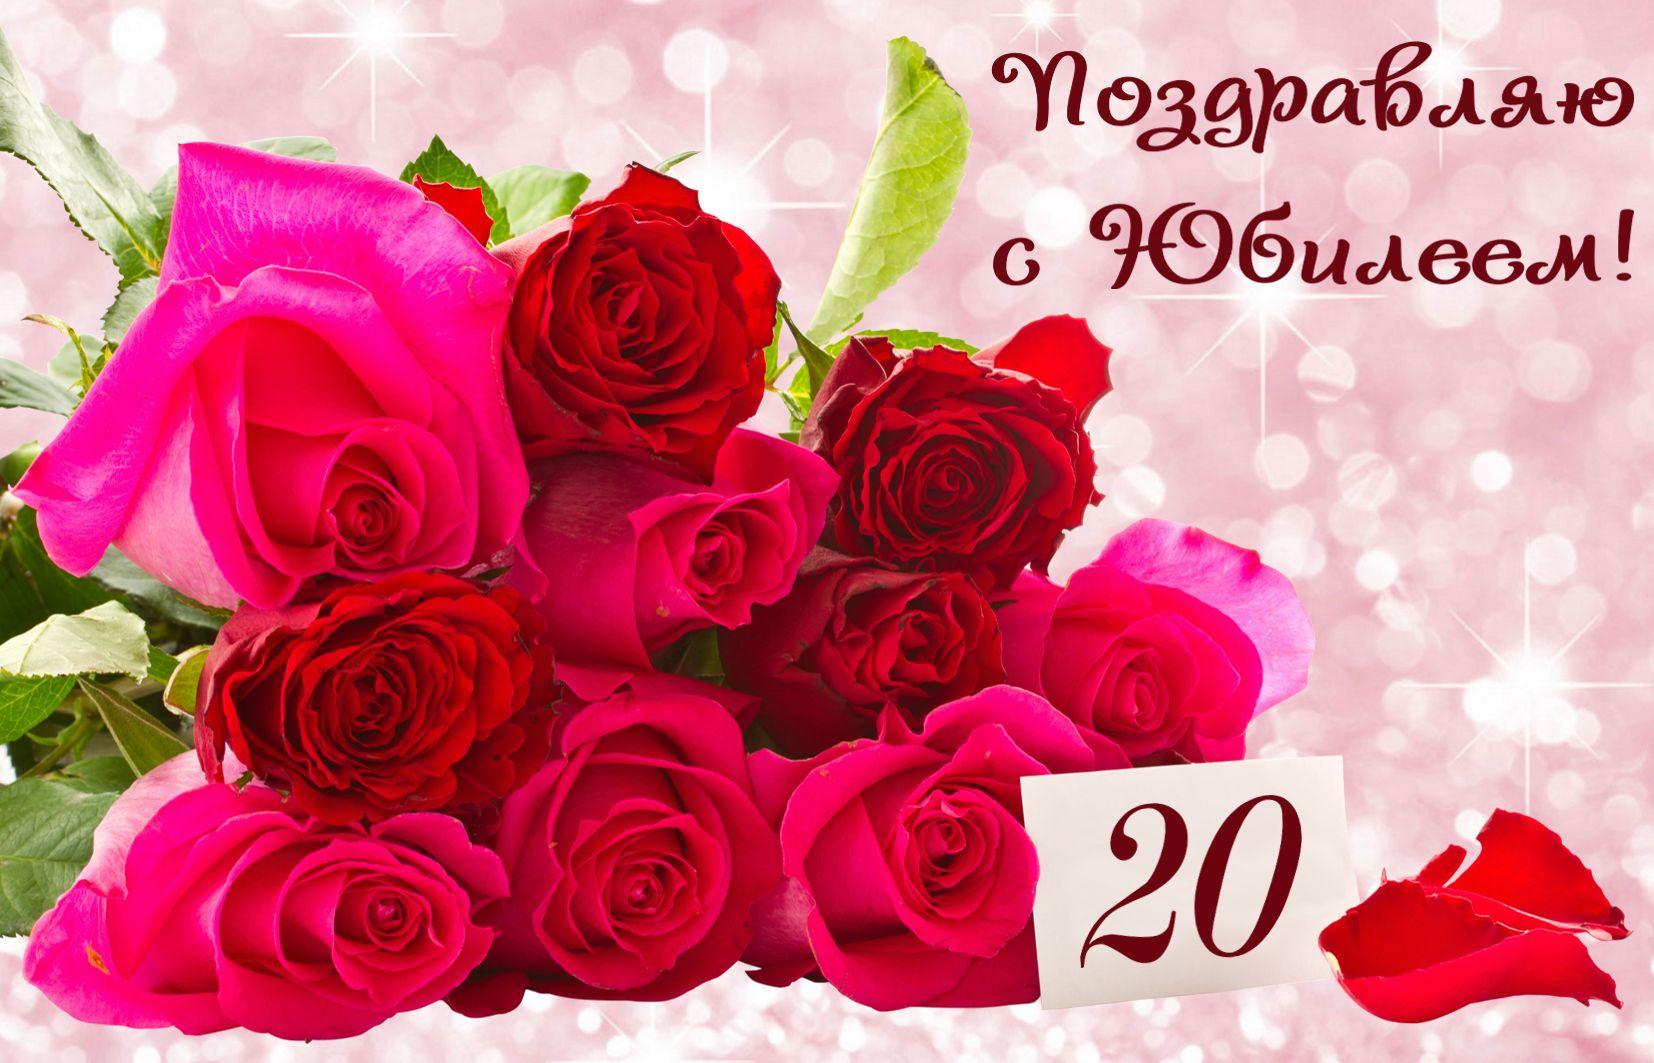 Картинка с юбилеем цветы